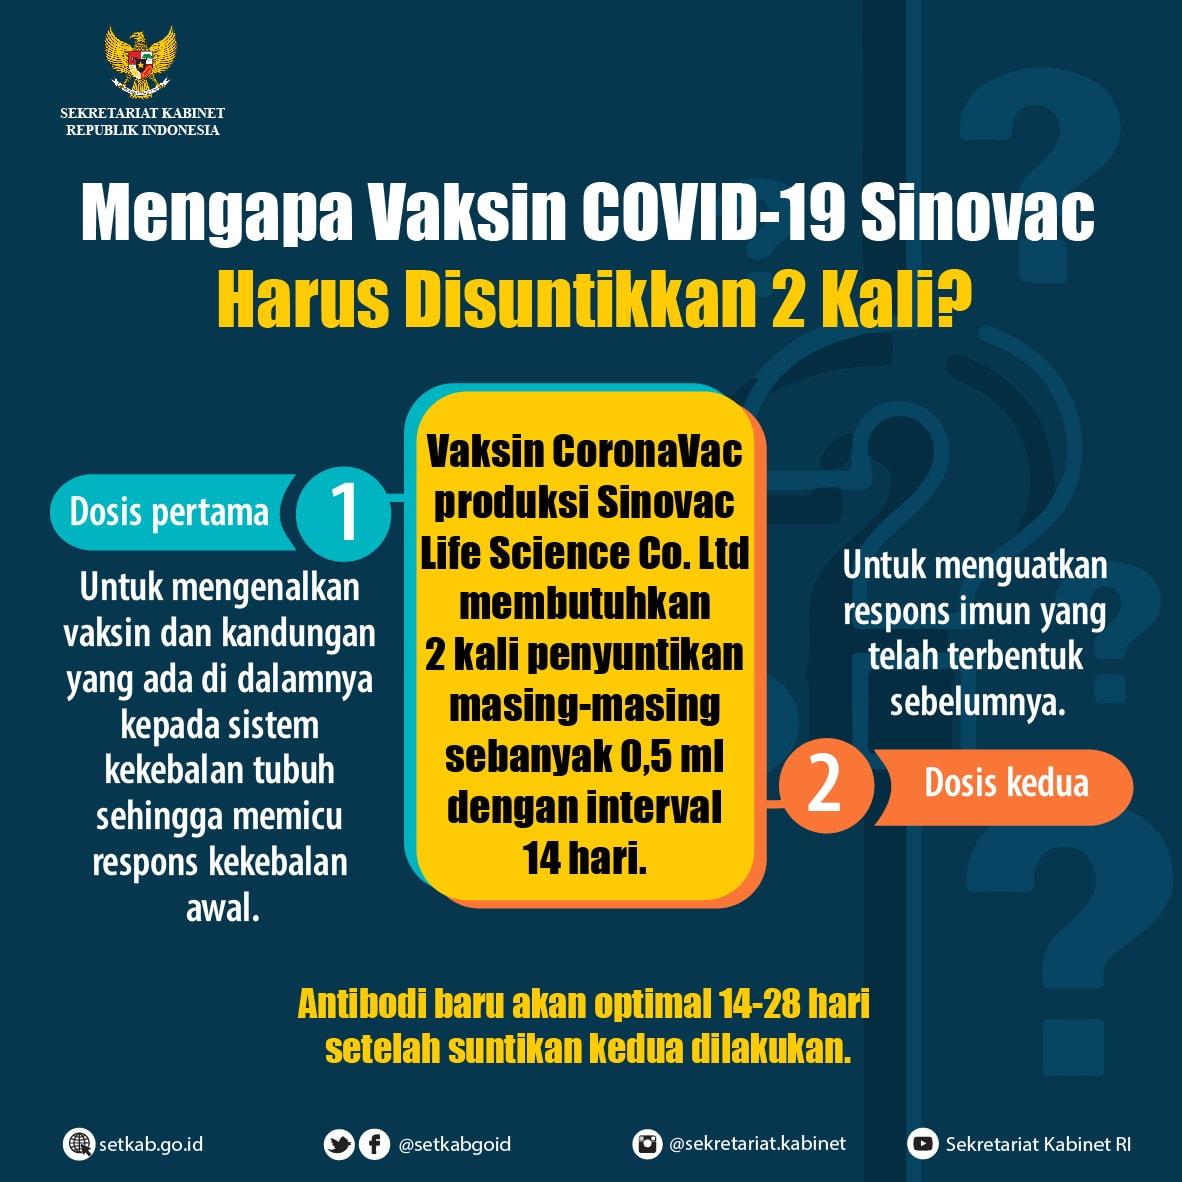 Mengapa Vaksin COVID-19 Sinovac Harus Disuntikkan 2 Kali?